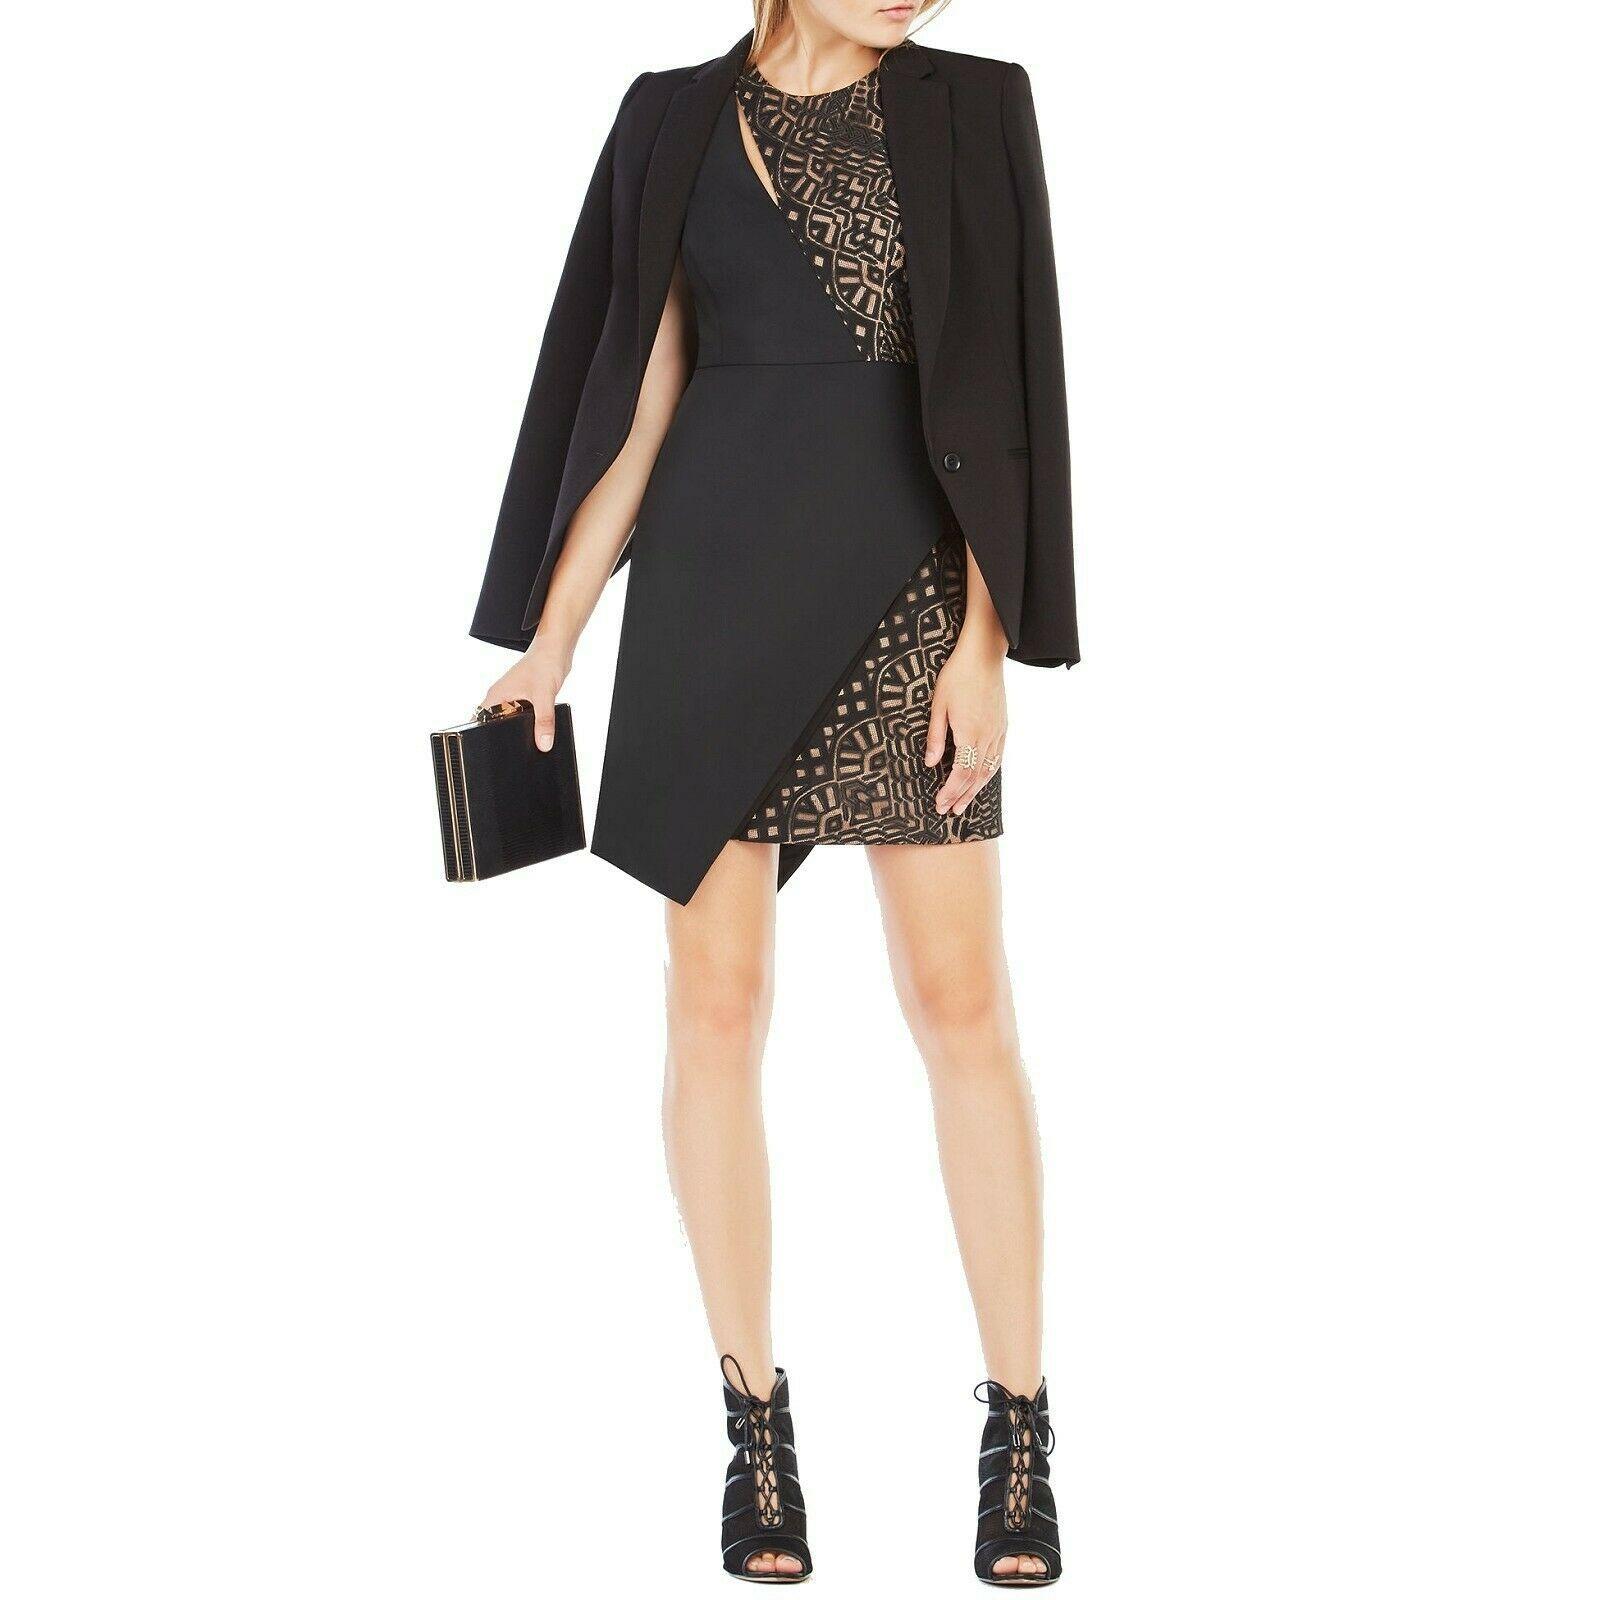 BCBG MAXAZRIA Black Kierra Satin Graphic Burnout Mesh Asymmetric Dress 0